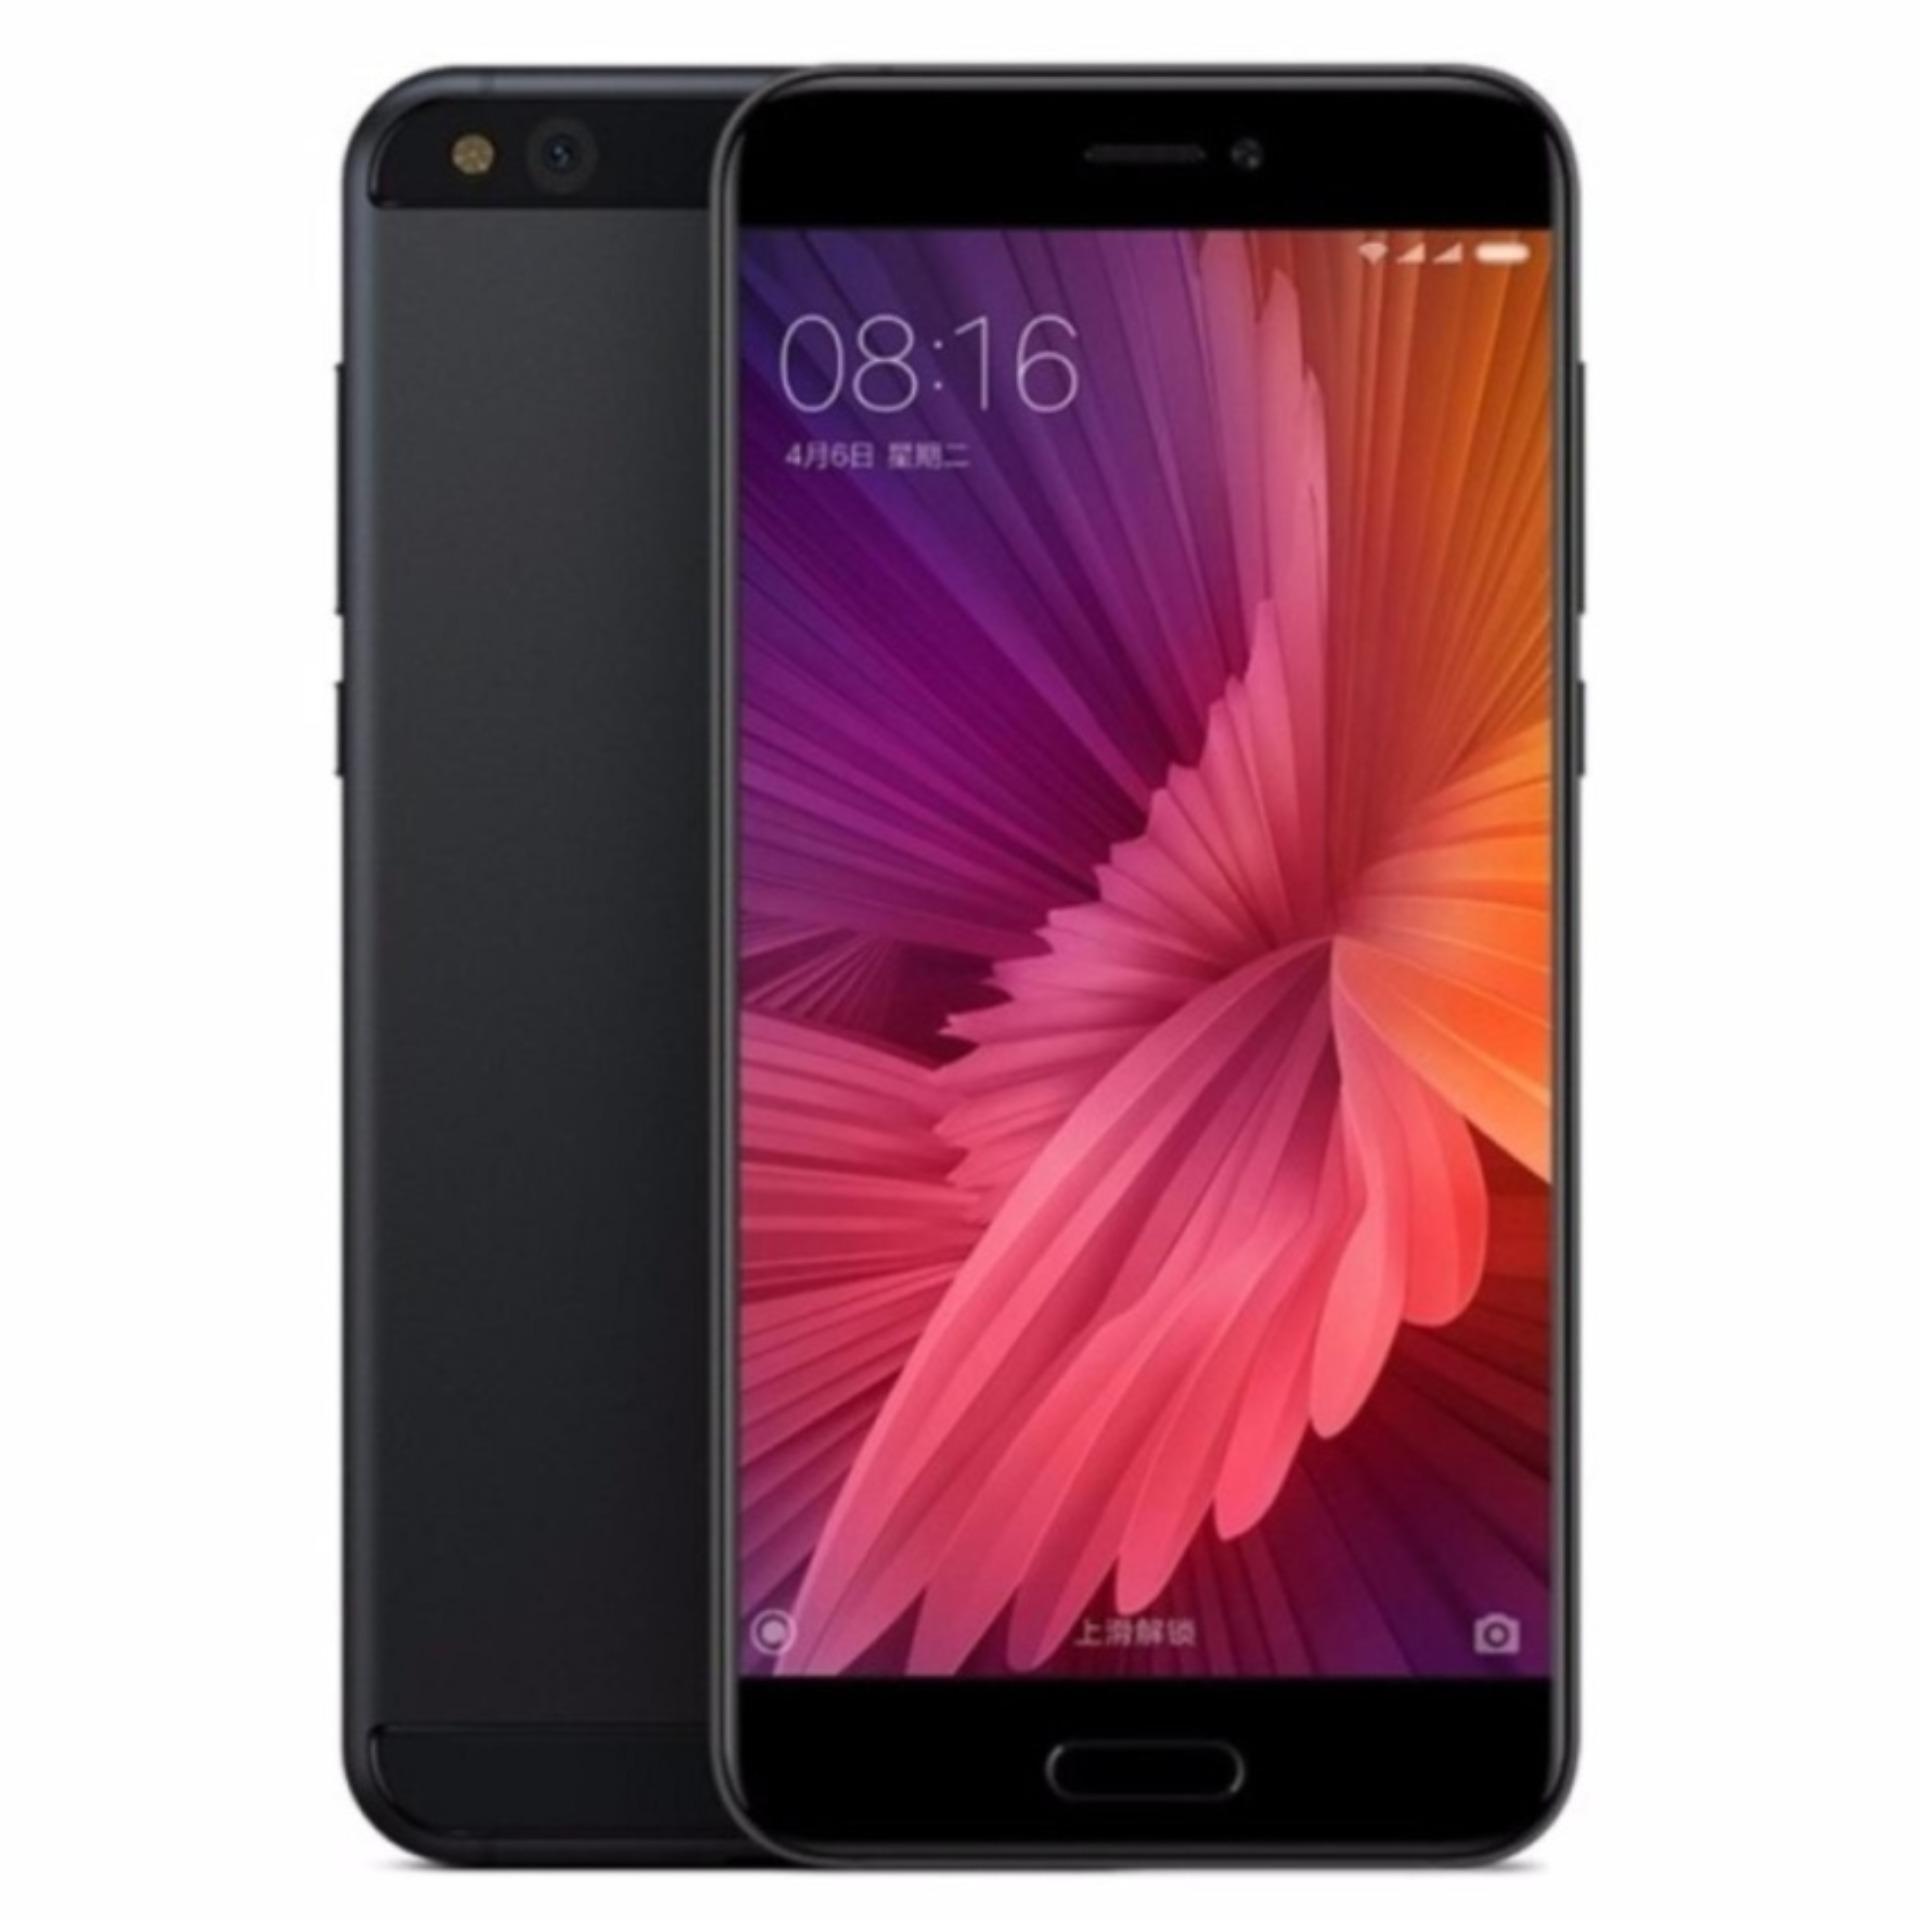 Beli Flash Sale Xiaomi Redmi 2 Snapdragon 410 4g Lte Garansi 1tahun Note 16gb Distributor 1 Tahun Mi 5c 3gb 64gb